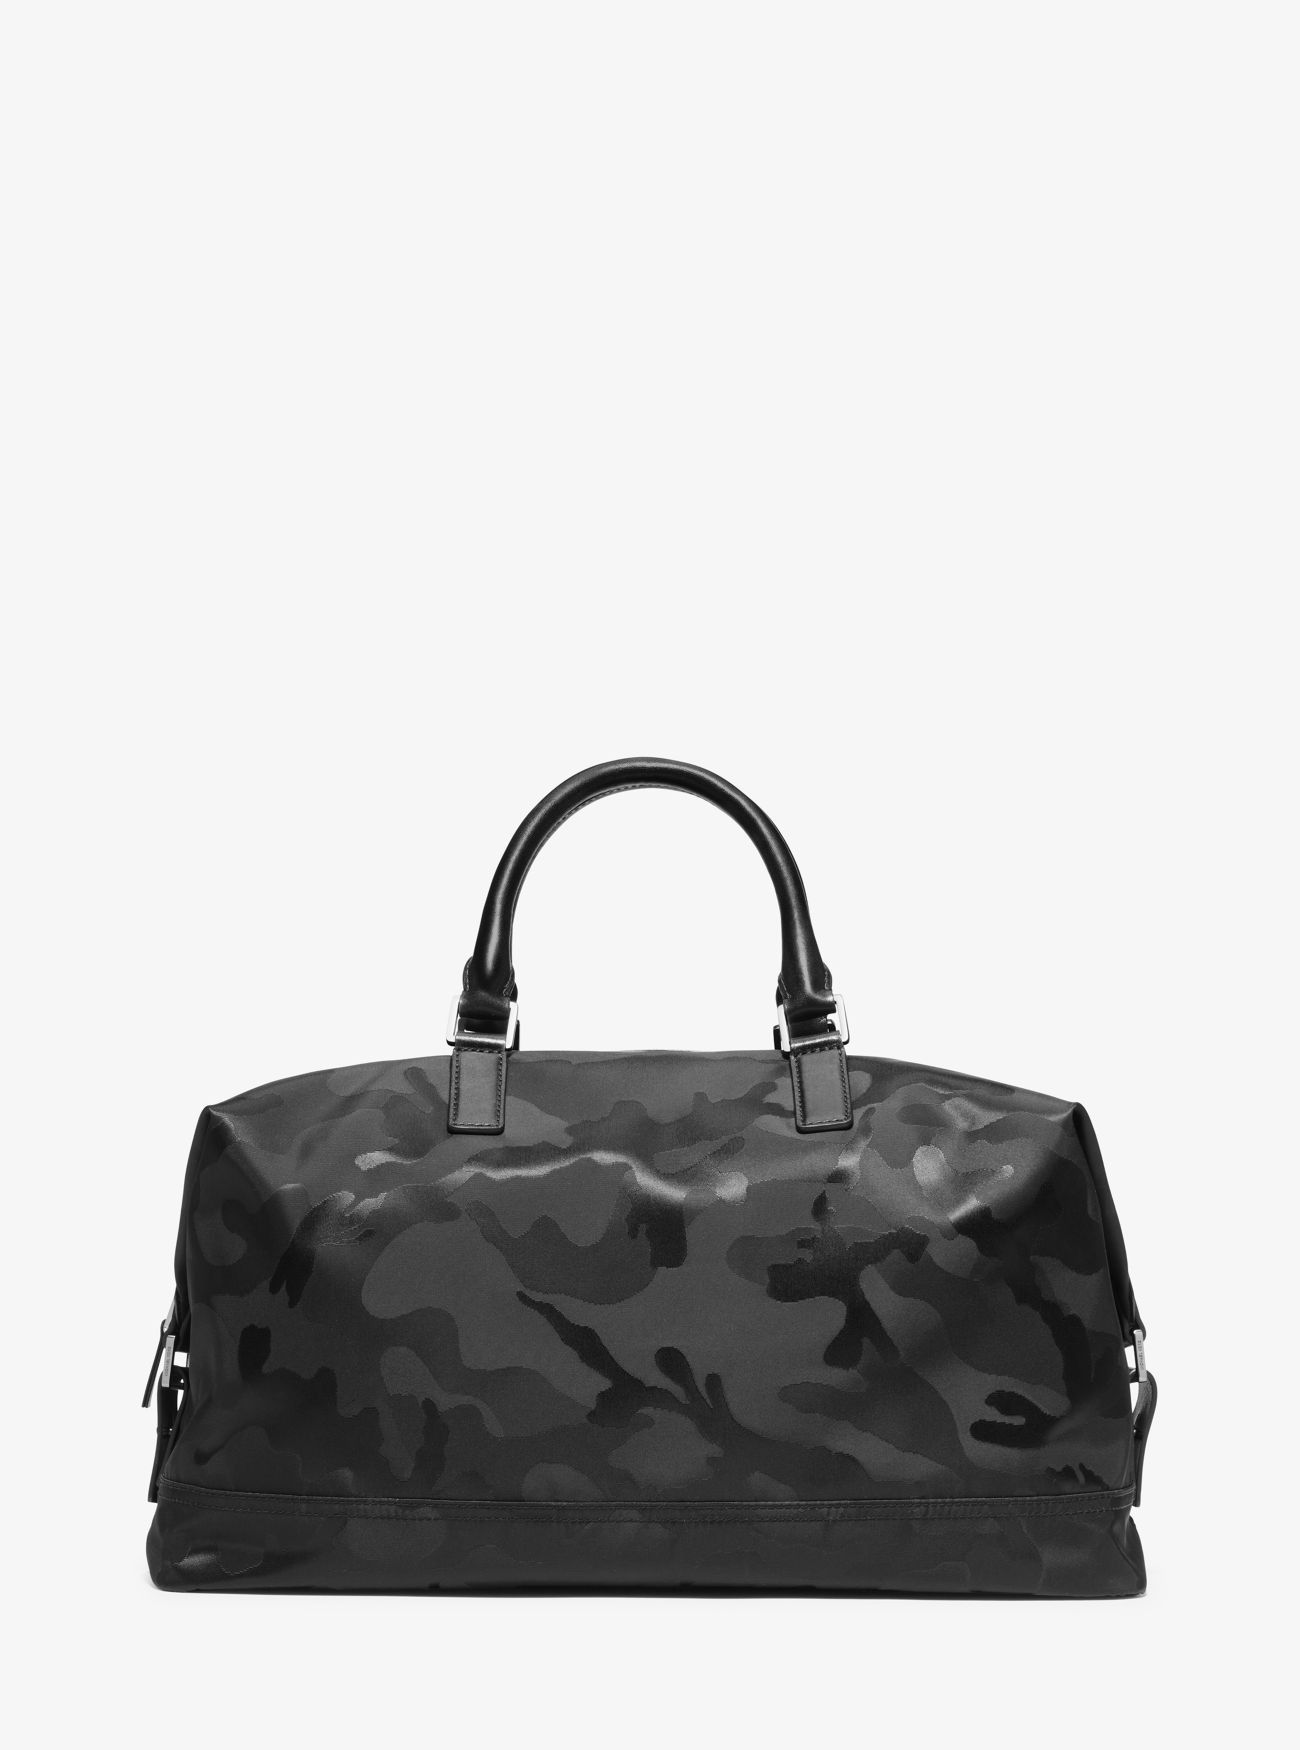 43fc08eda448 MICHAEL KORS Kent Camouflage Nylon Duffel.  michaelkors  bags  leather   accessories  shoulder bags  wallet  hand bags  nylon